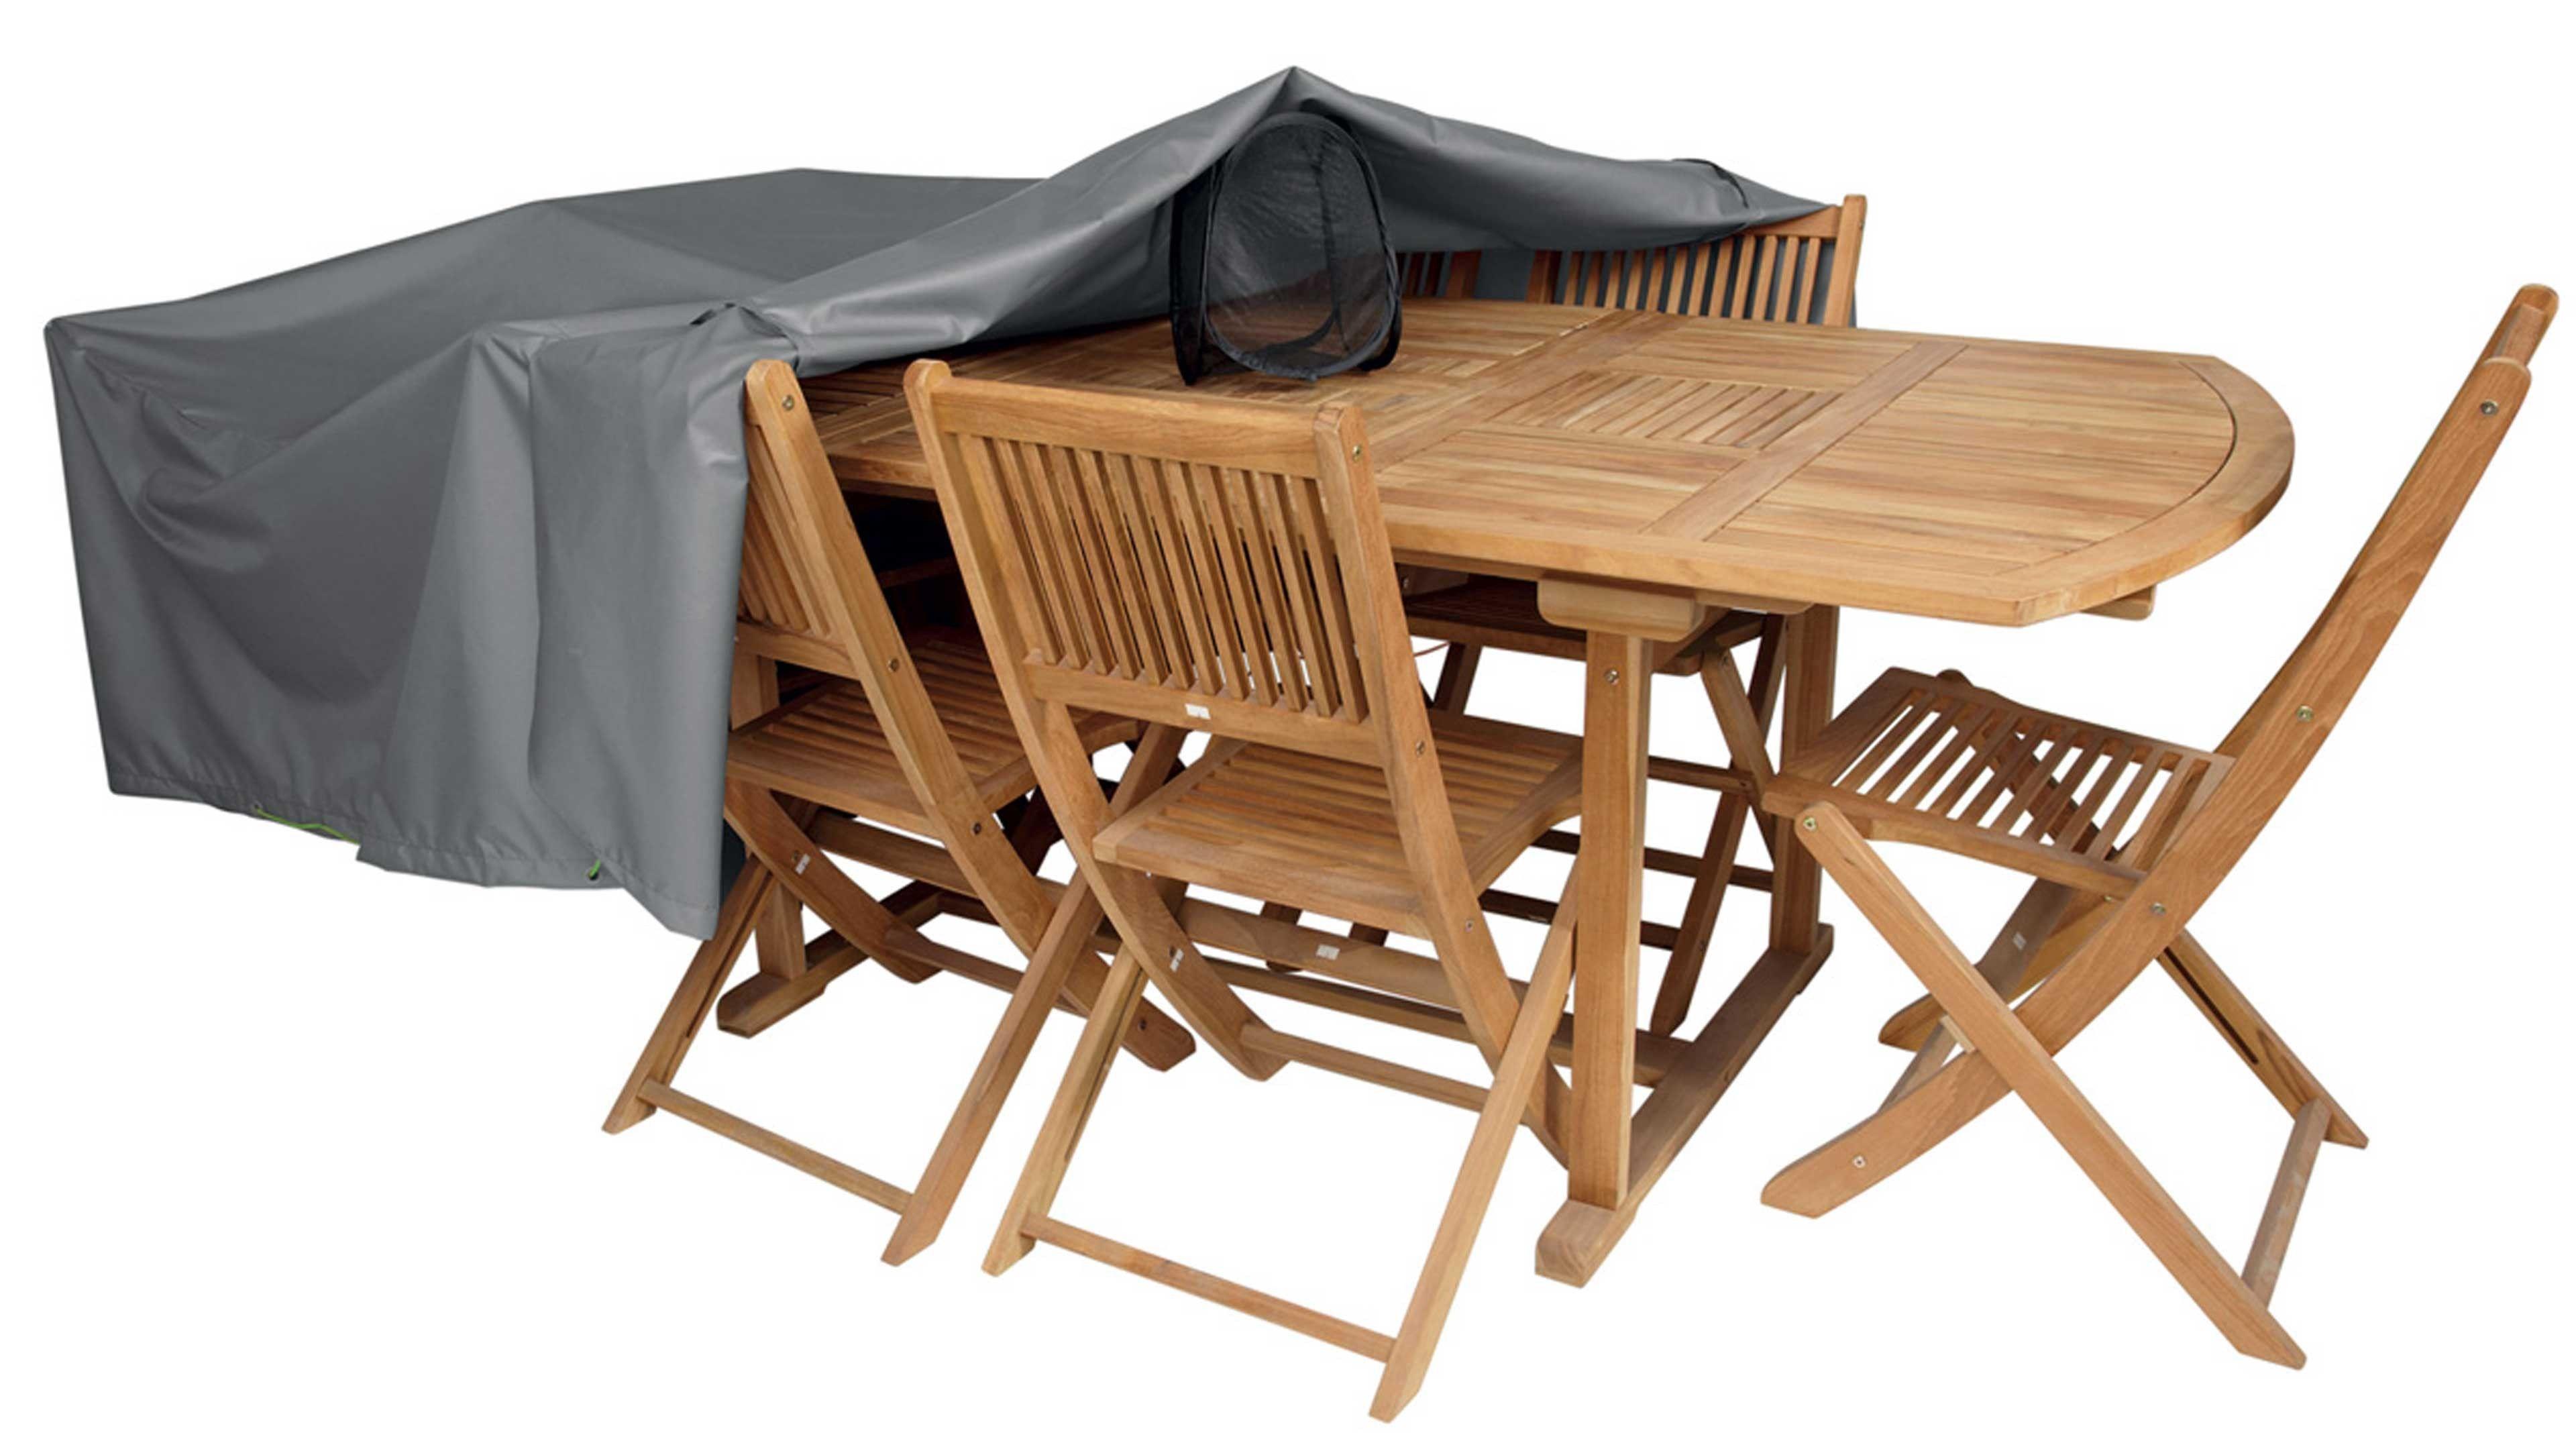 Housse table jardin 240 cm | Cov Up